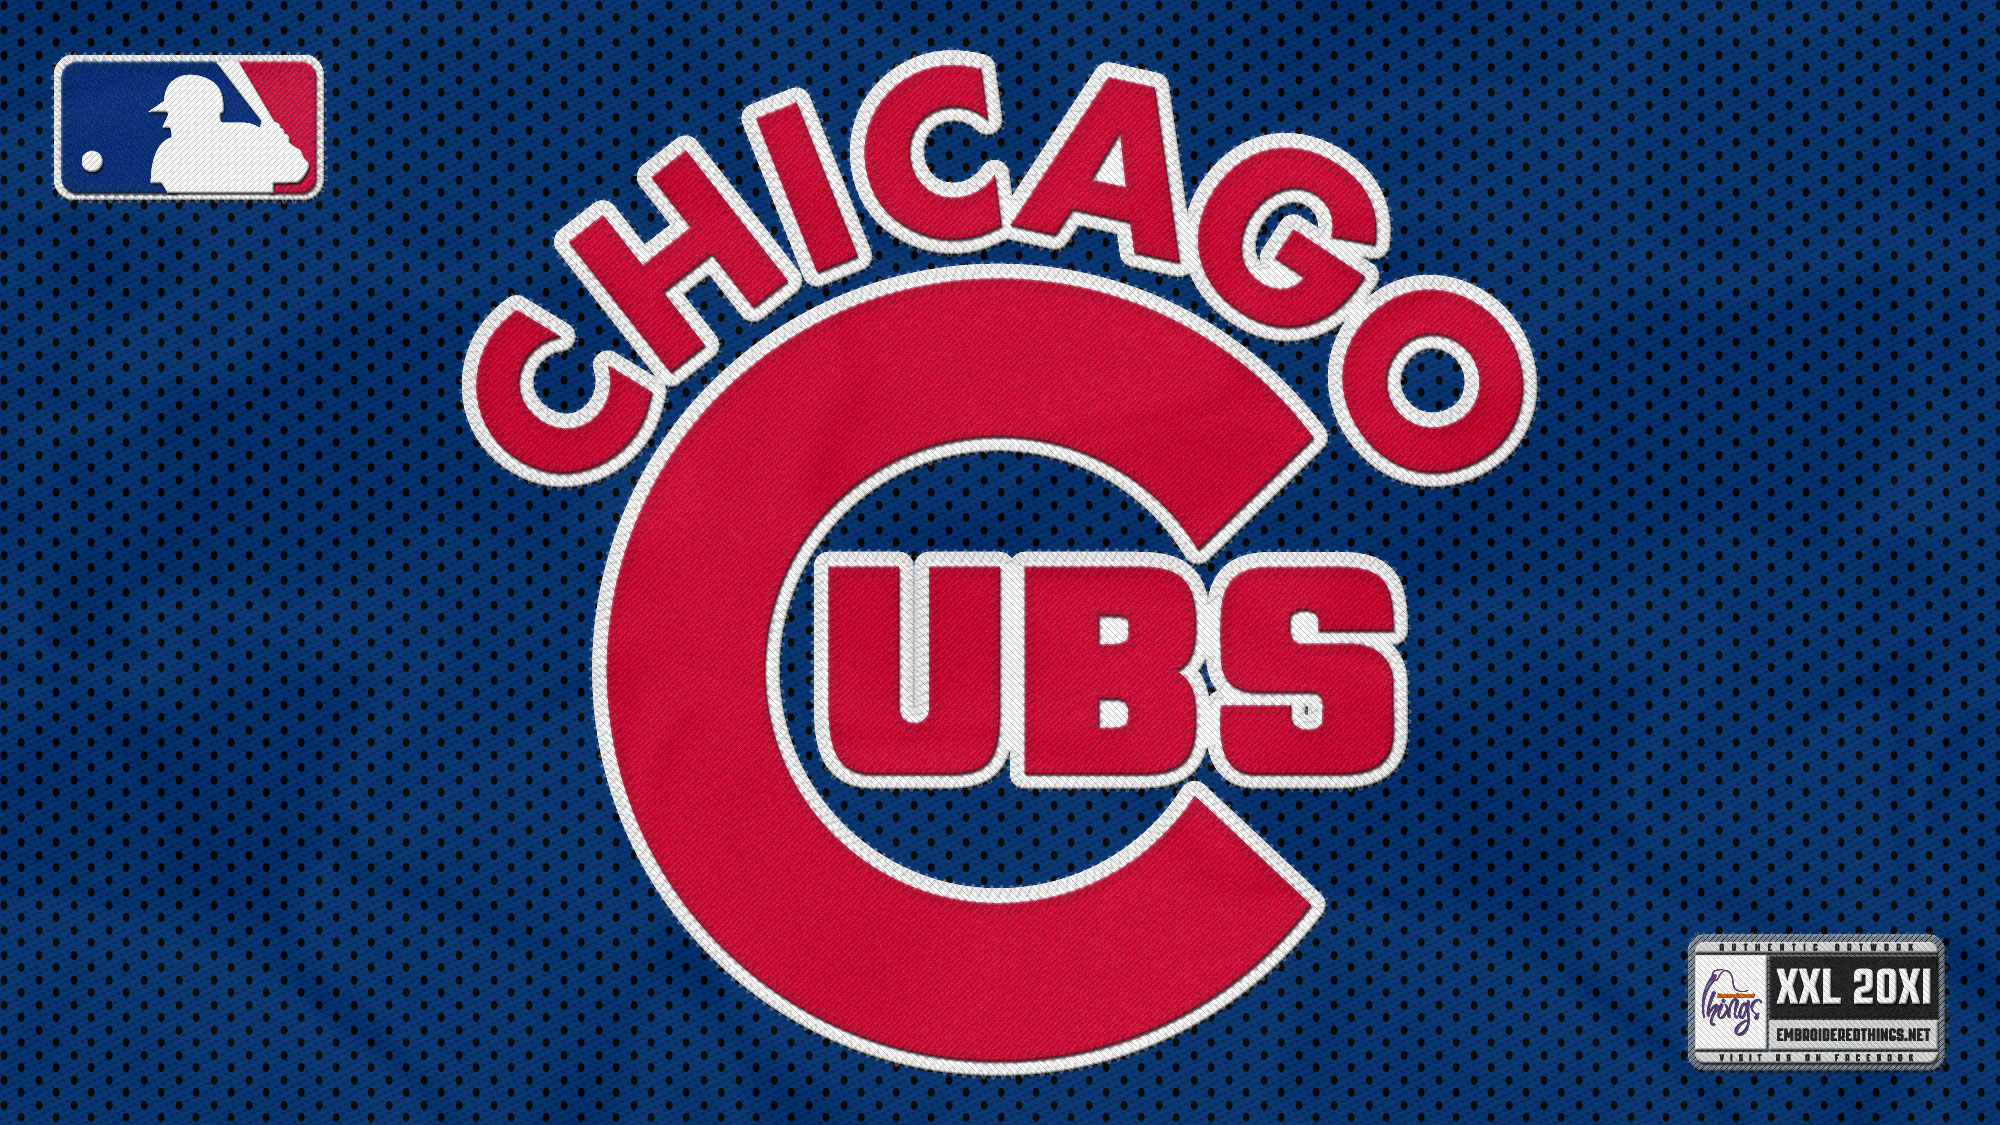 CHICAGO CUBS mlb baseball 9 wallpaper 2000x1125 232516 2000x1125